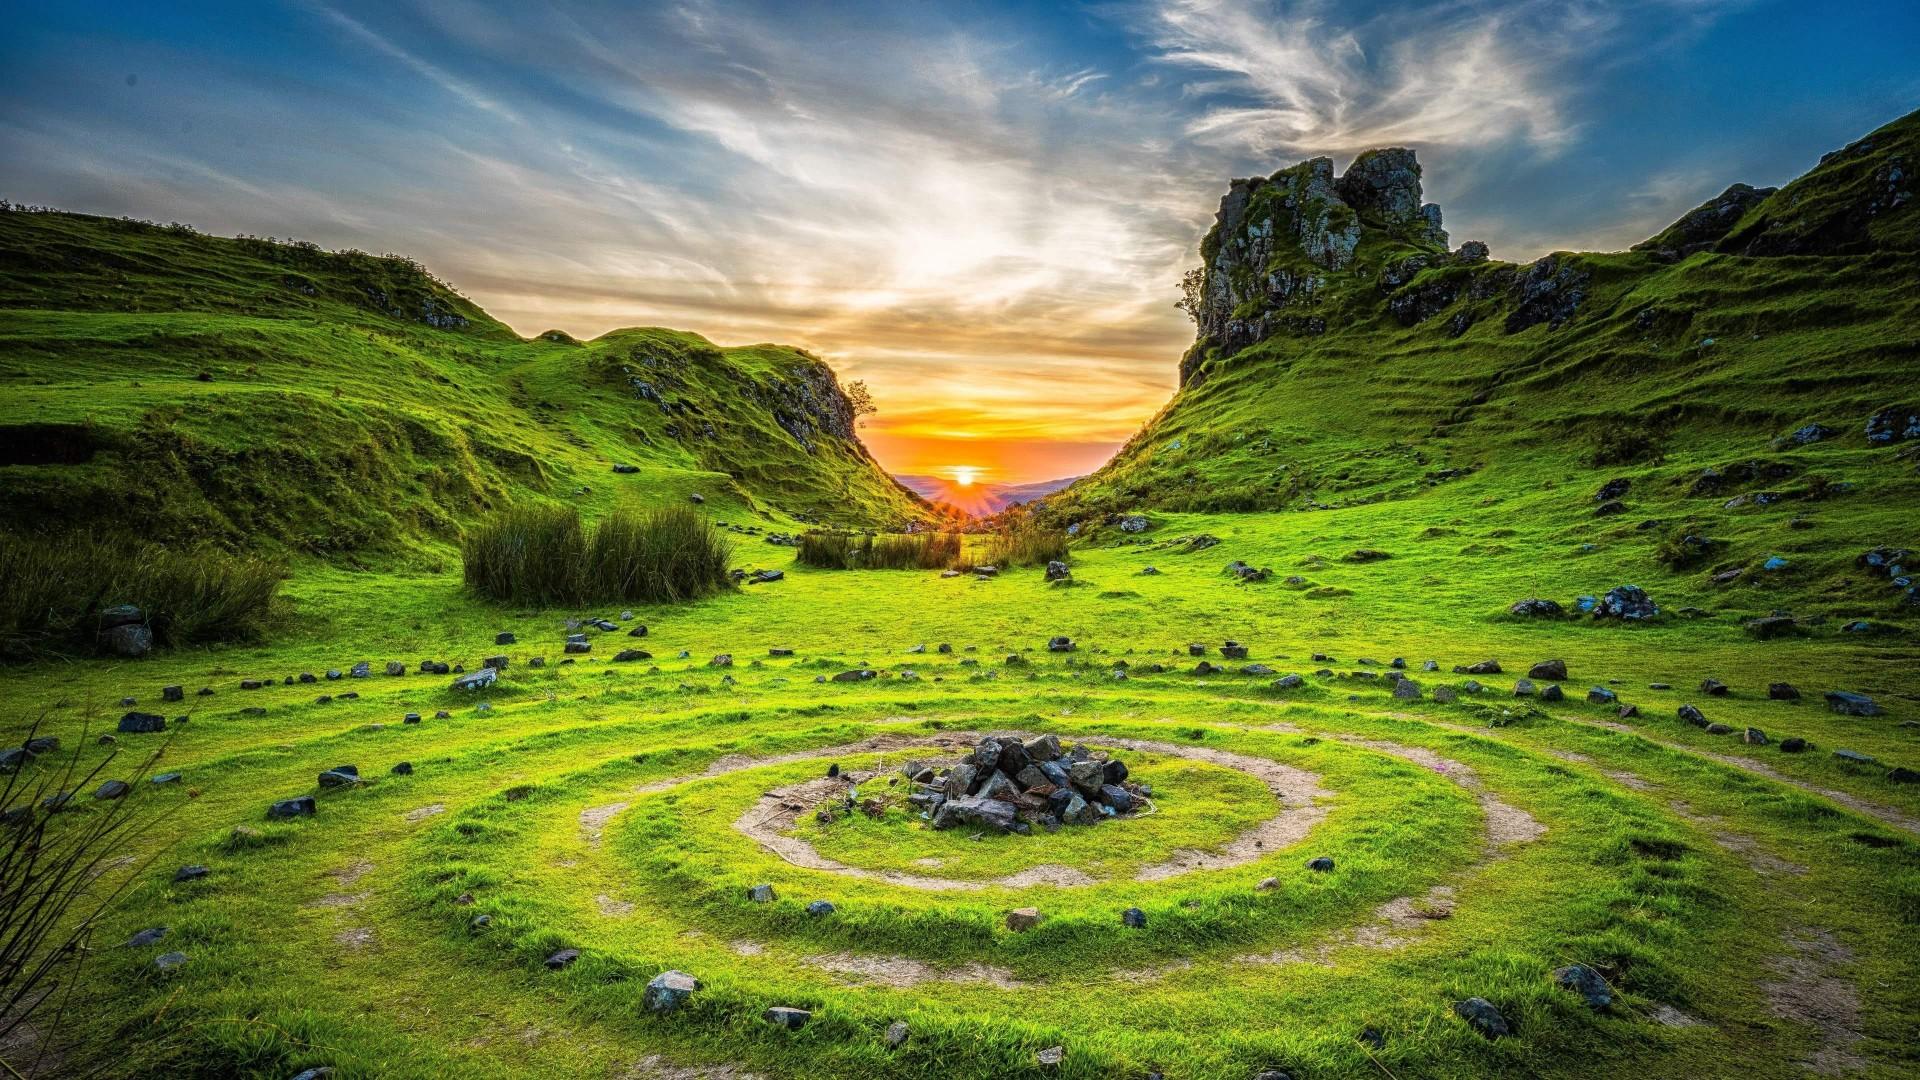 Wallpaper Fairy Glen Isle Of Skye Scotland Europe Nature